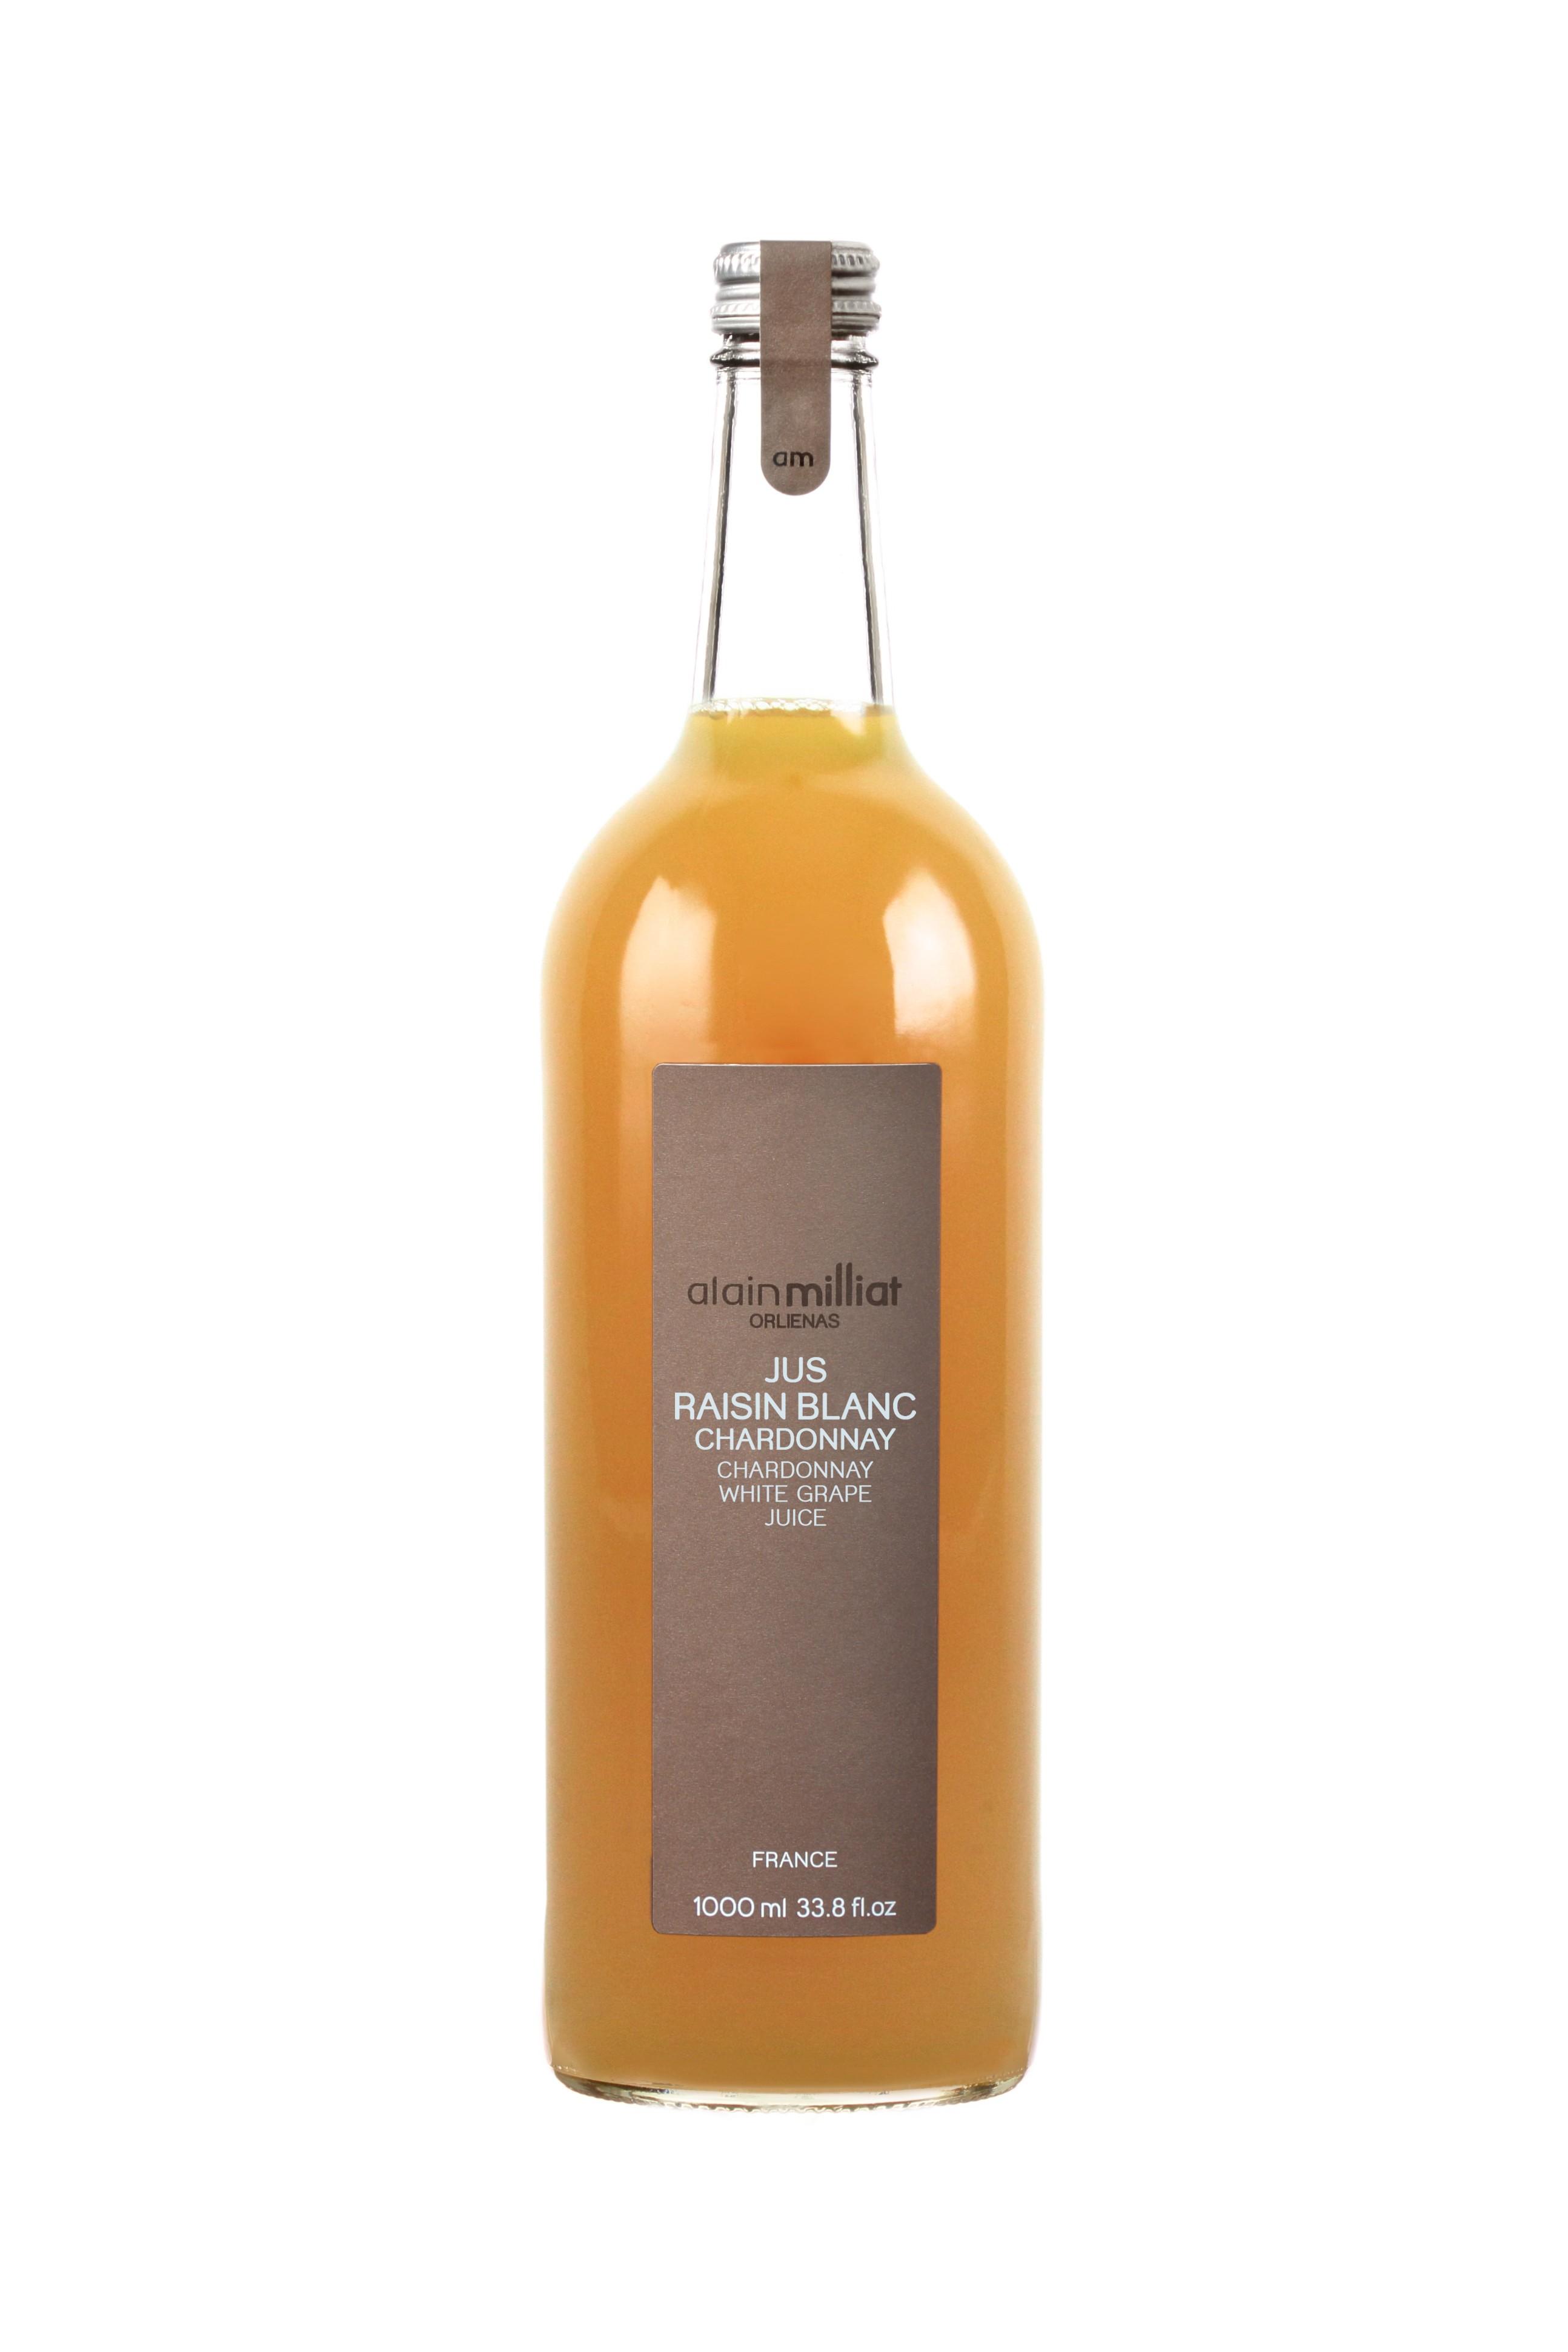 Jus Raisin Blanc Chardonnay, Alain Milliat (1 L)